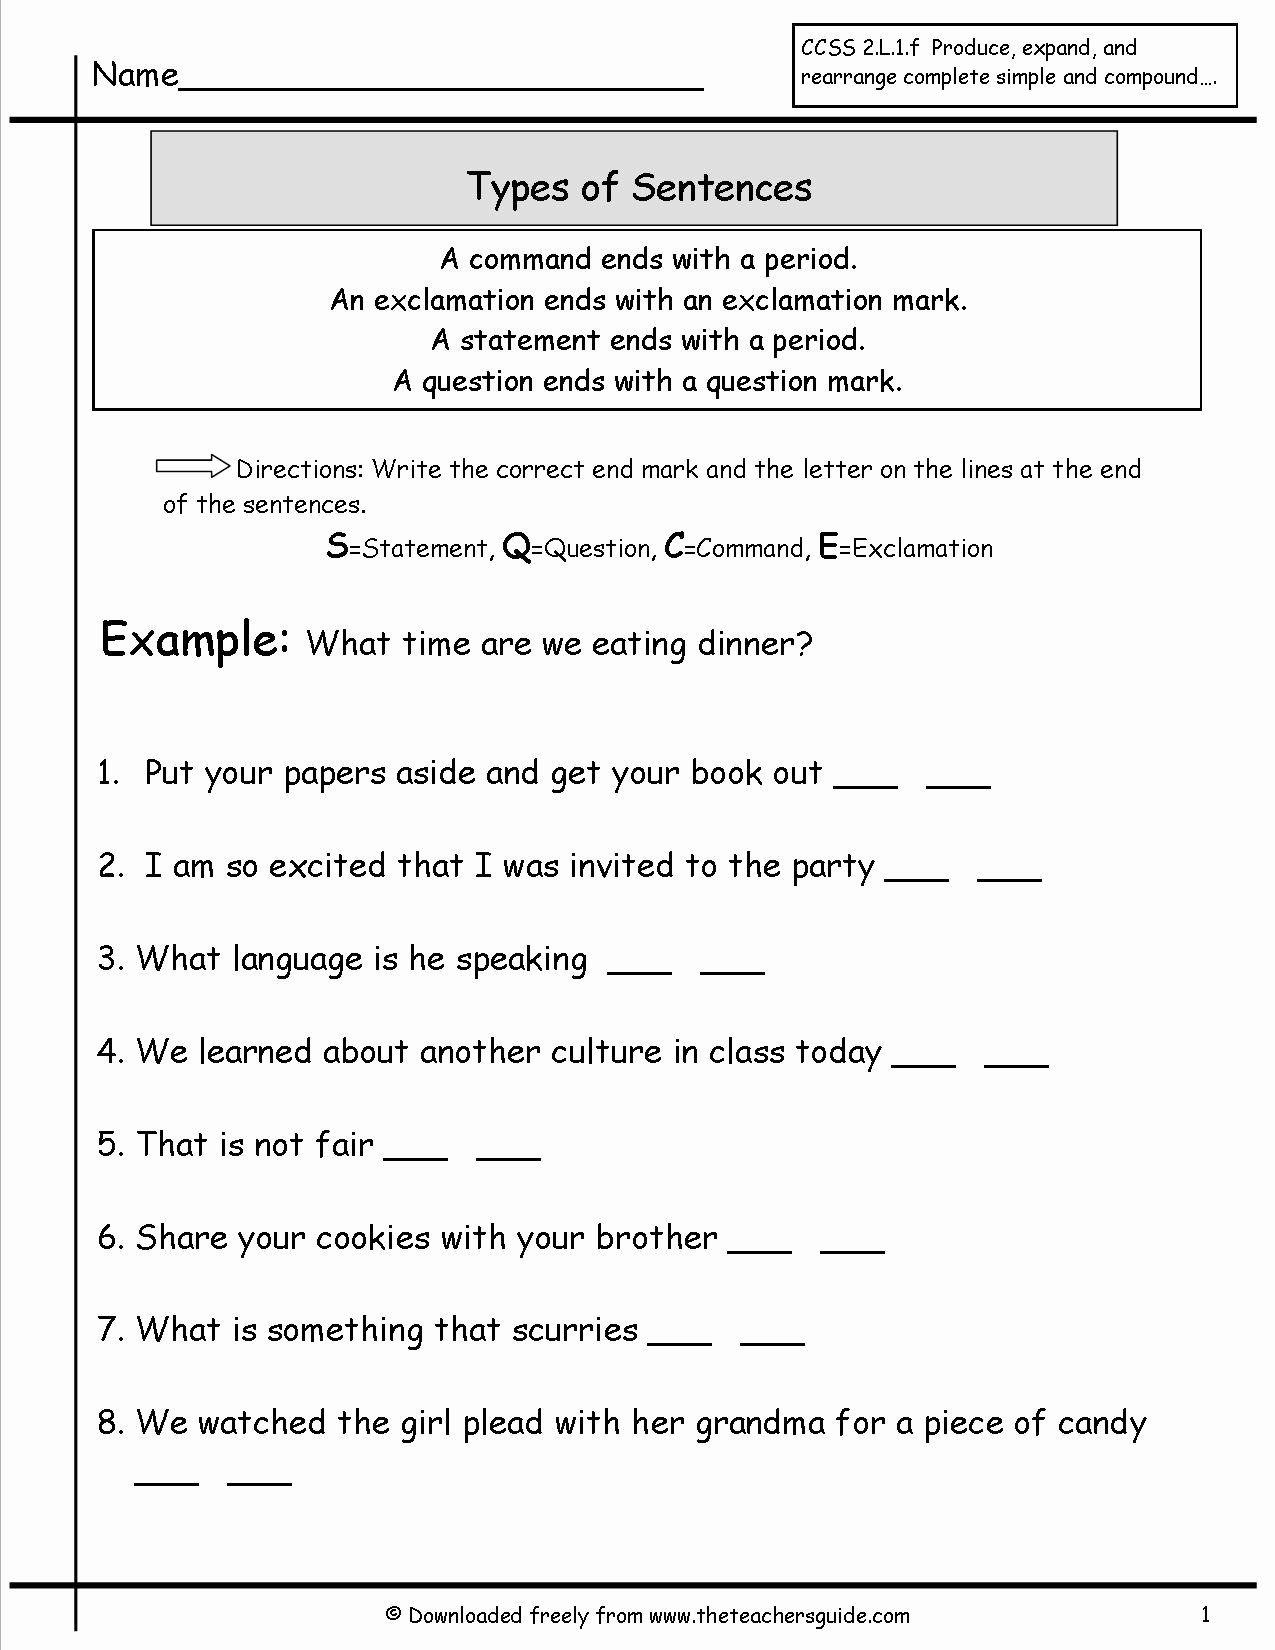 Four Types Of Sentences Worksheet Luxury Sentences